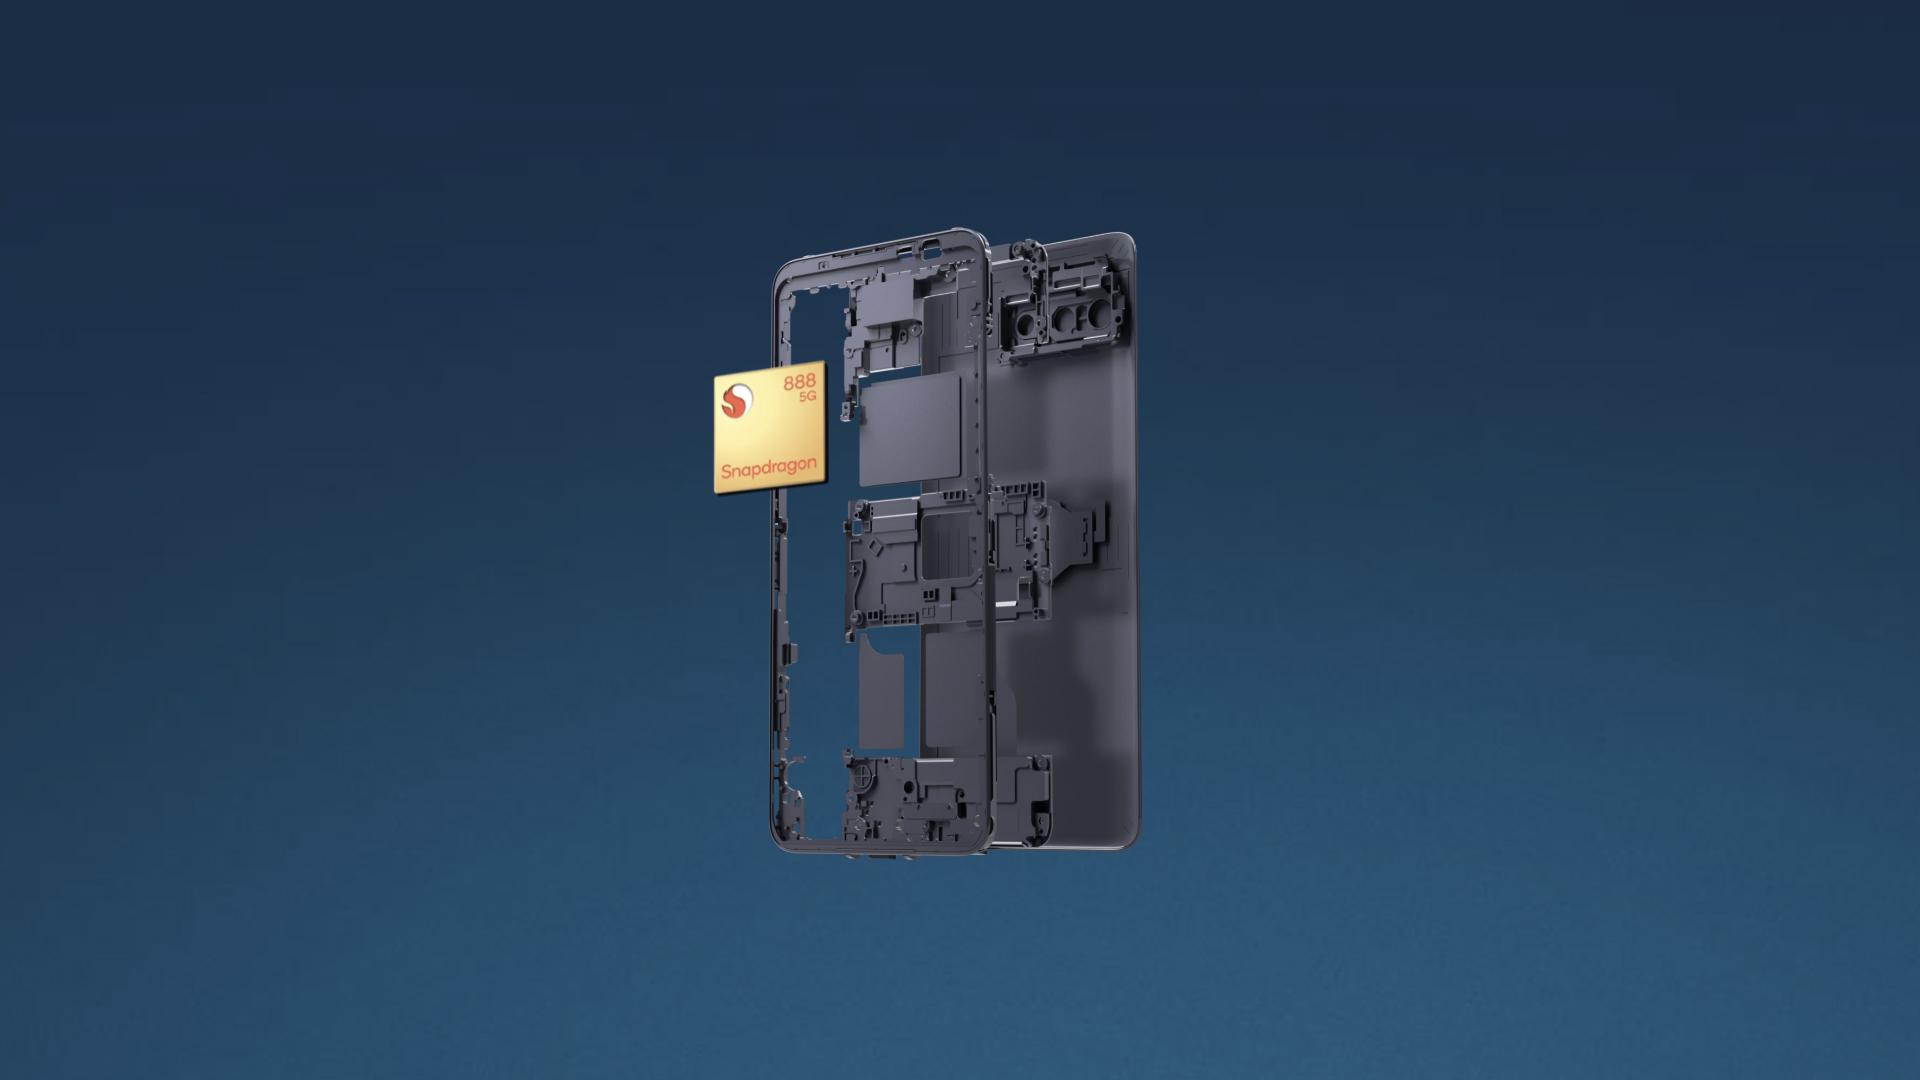 Qualcomm Snapdragon Smartphone For Insiders Snapdragon 888 Processor